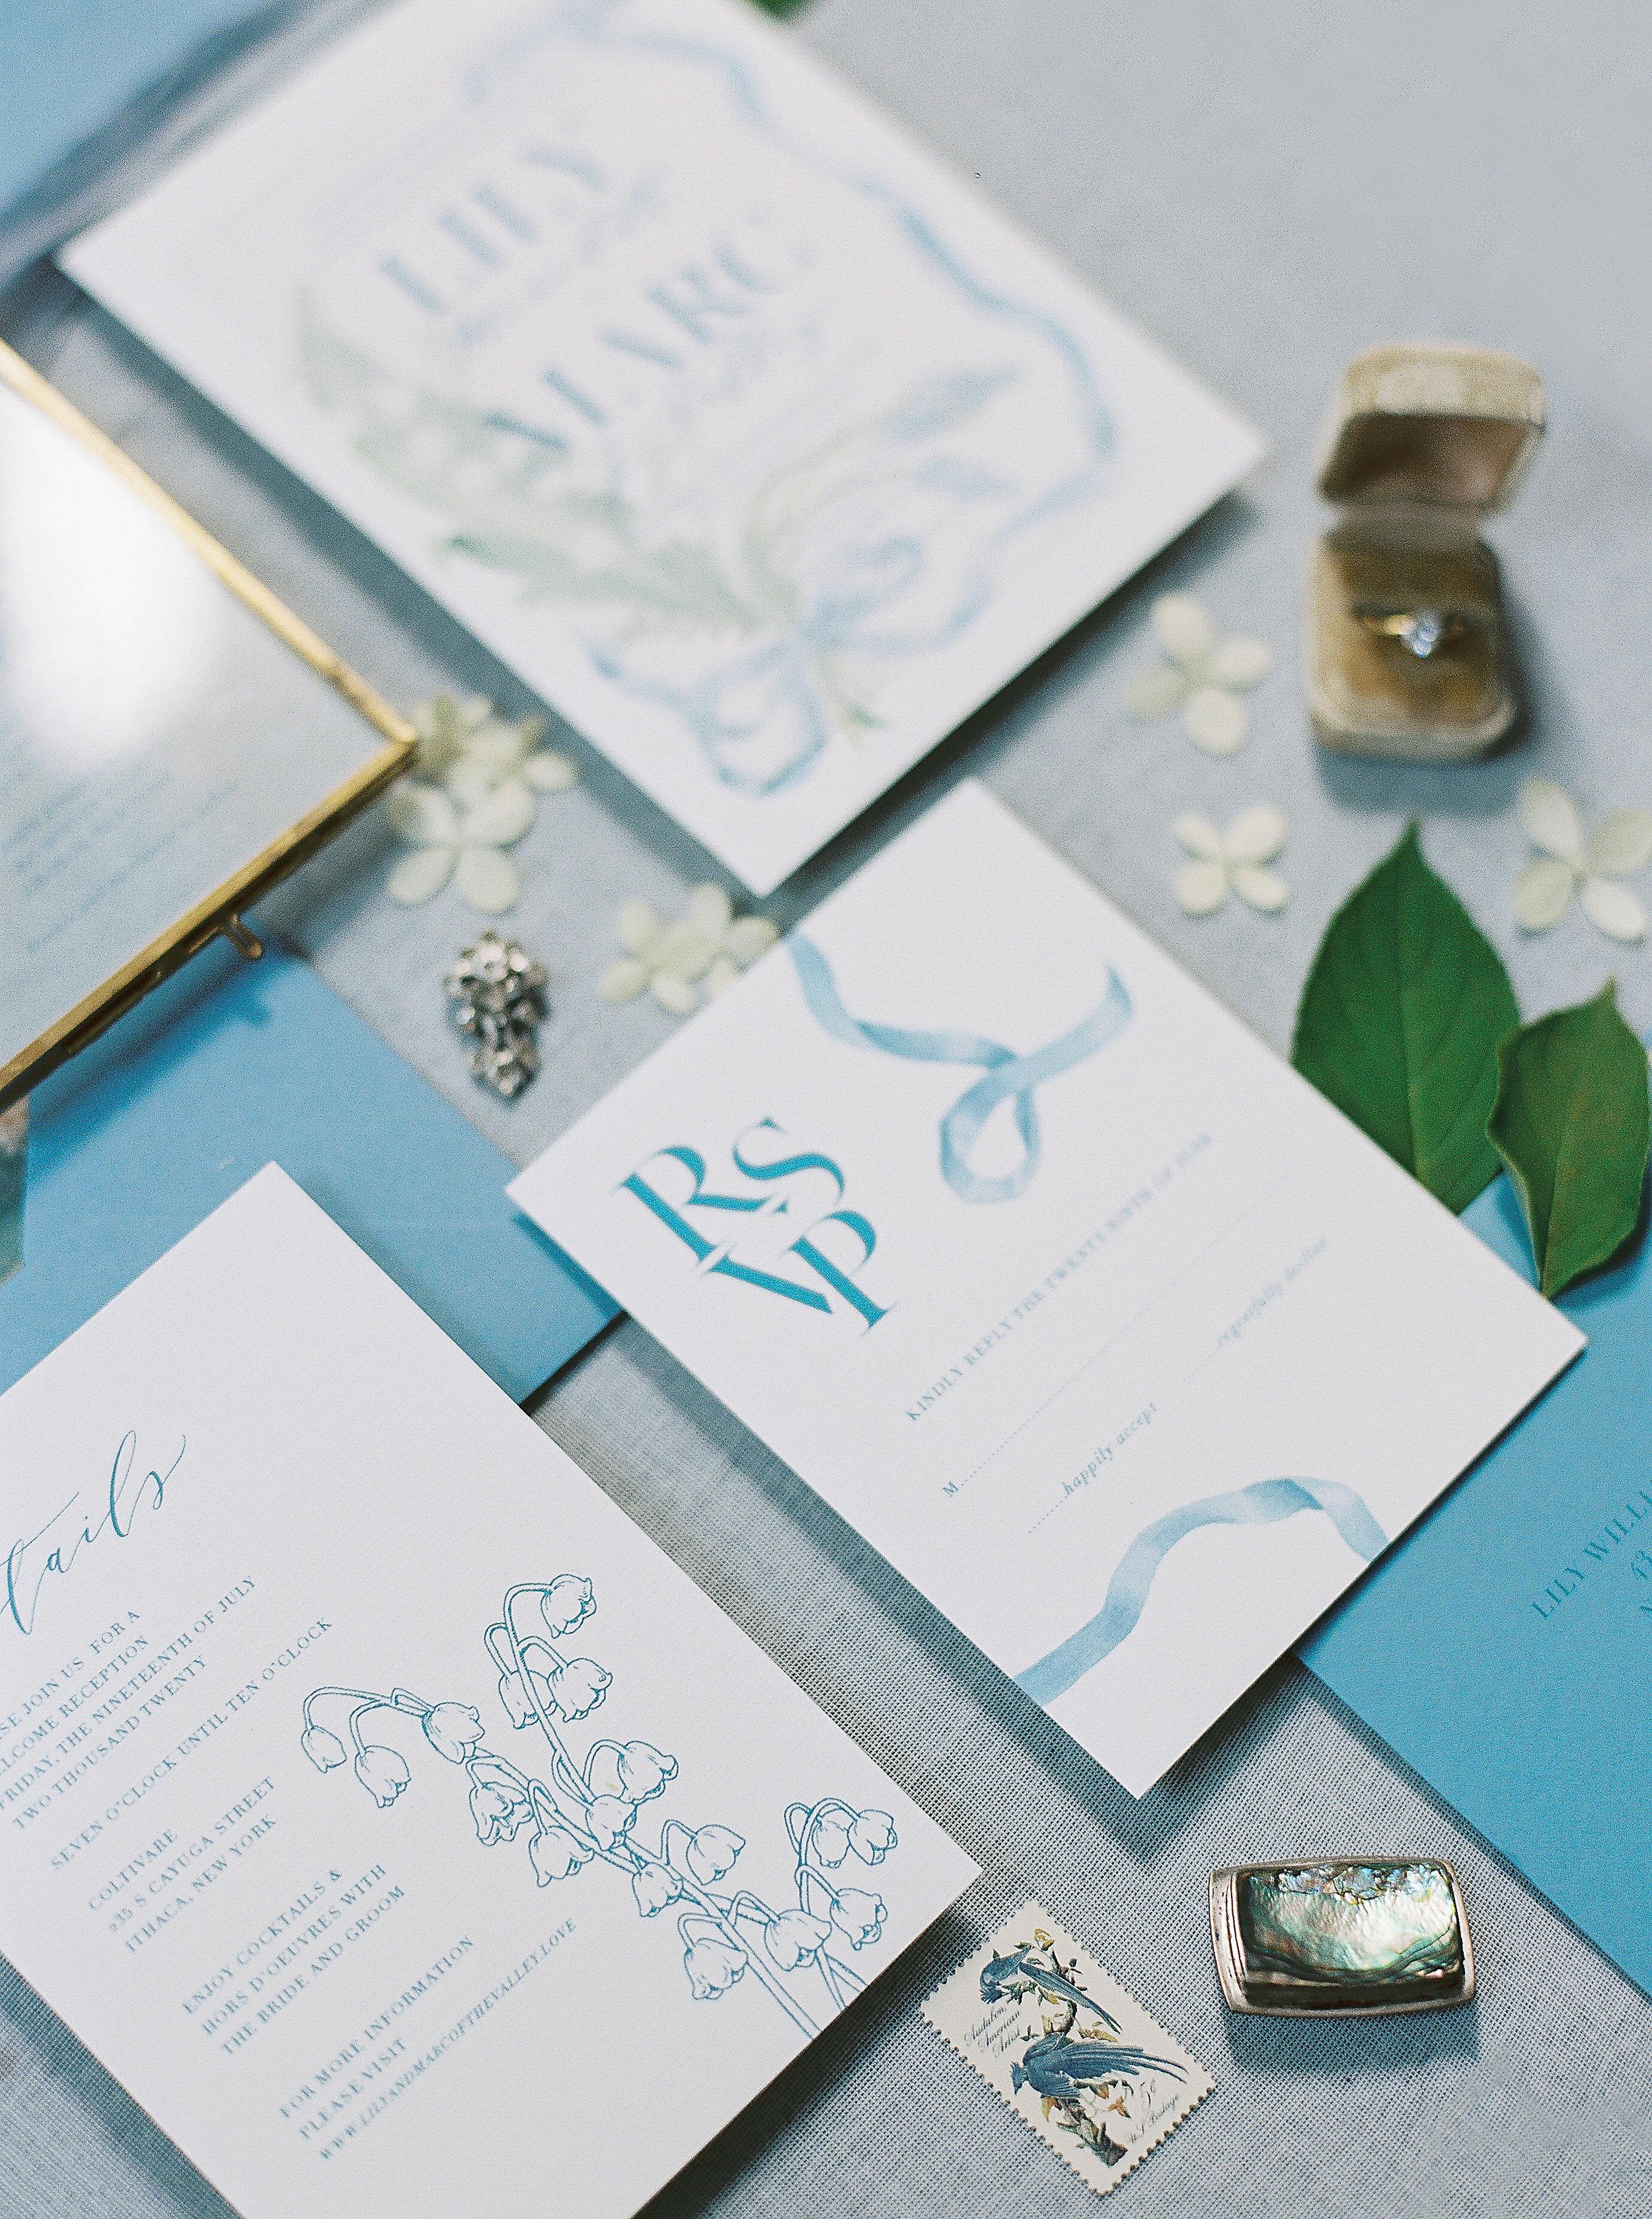 Alexandra-Elise-Photography-Film-Branding-Photographer-Rochester-New-York-Stone-Fruit-Studio-Wedding-Invitations-023.jpg